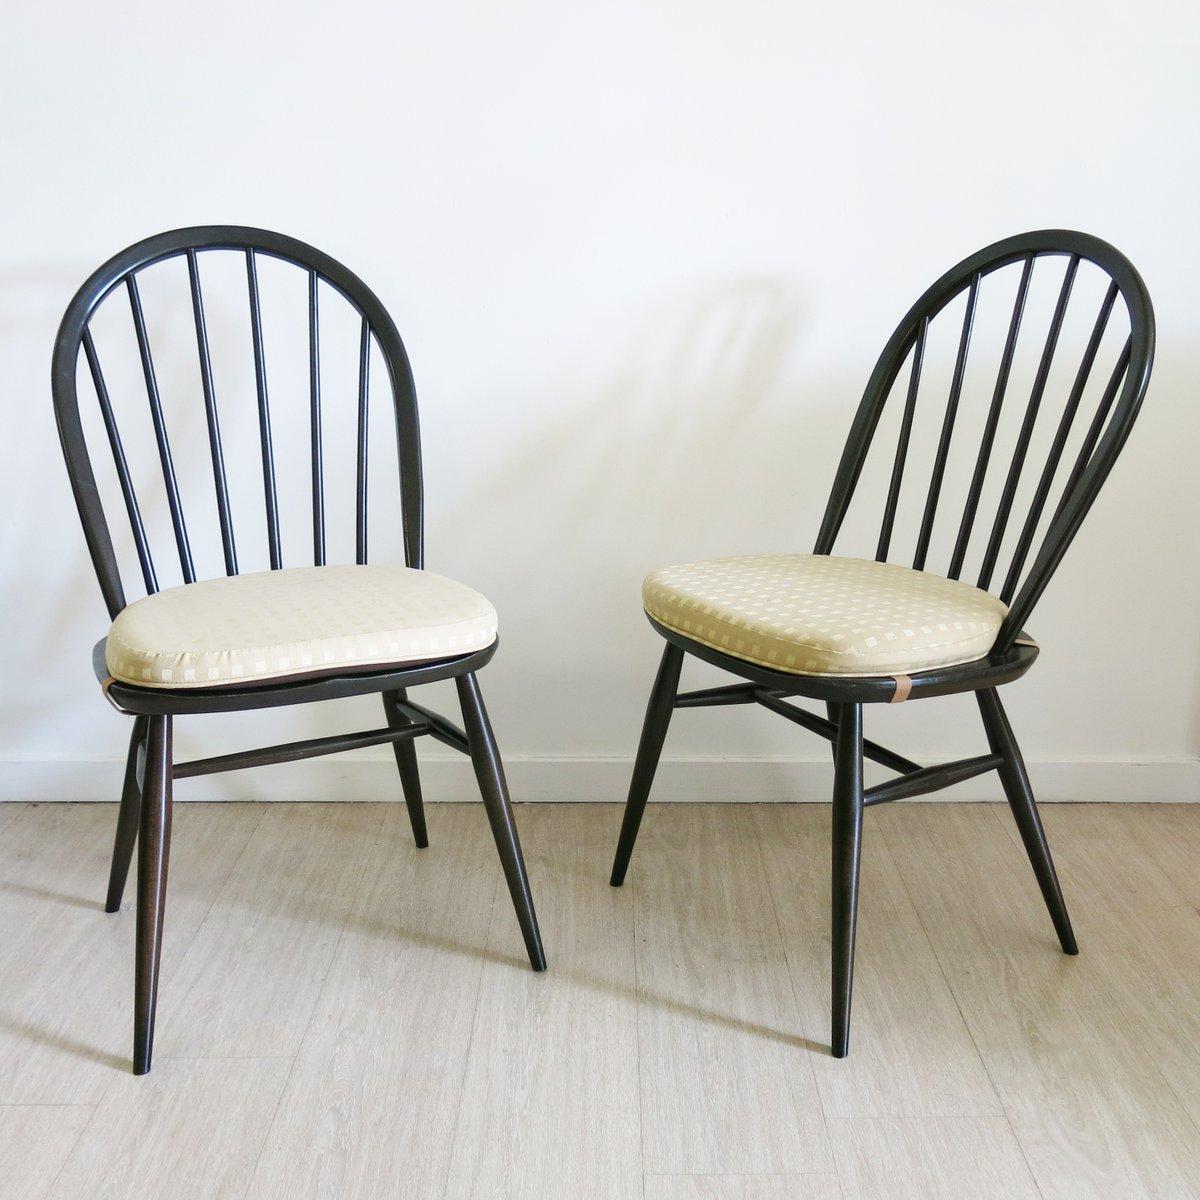 windsor st hle von lucian ercolani f r ercol 1970er 2er set bei pamono kaufen. Black Bedroom Furniture Sets. Home Design Ideas